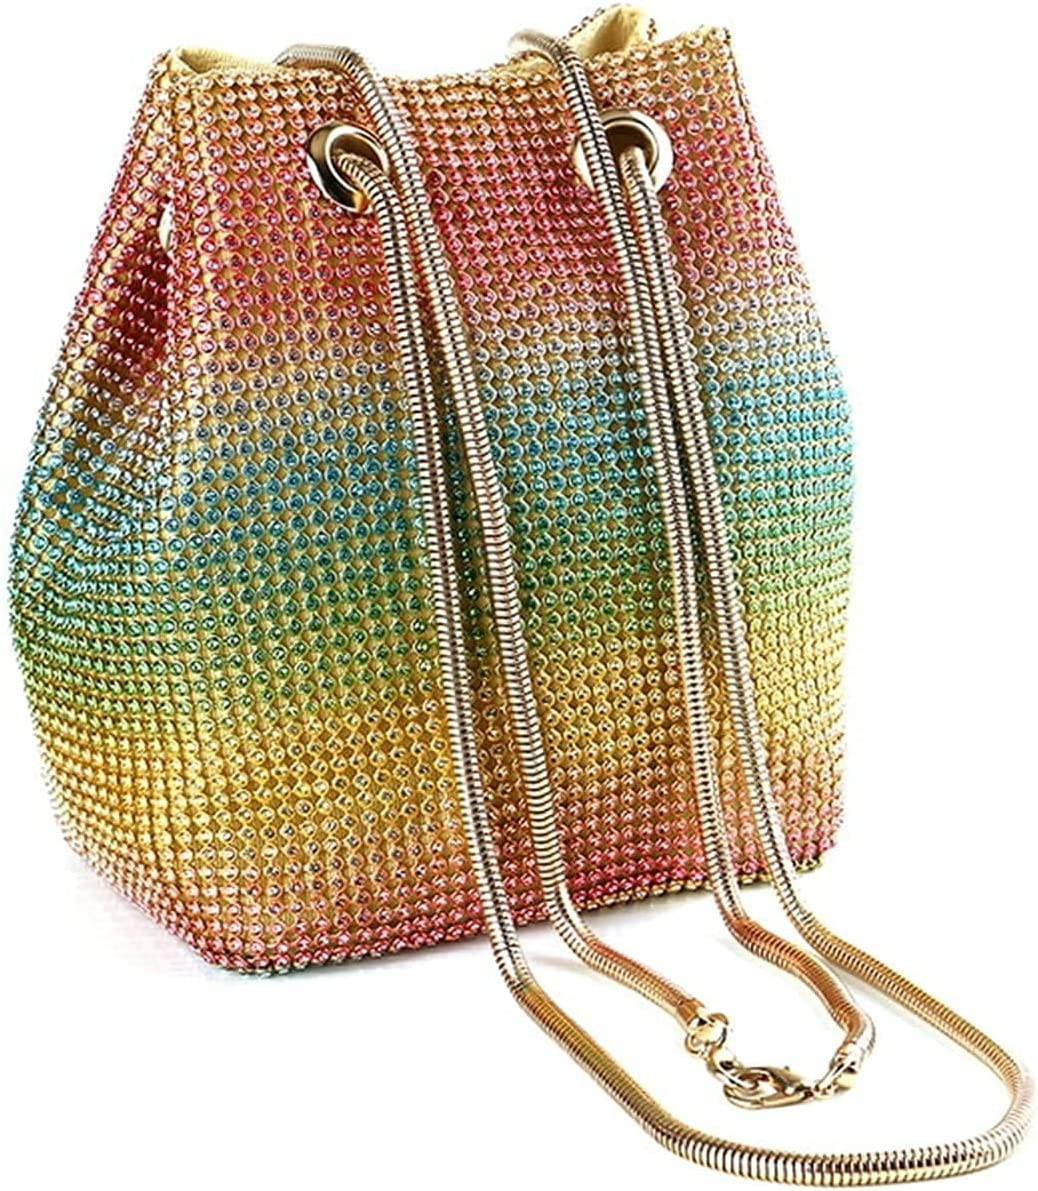 Women's Evening Handbags Rainbow Clutch Purses for Women Bucket Evening Bags Crystal Rhinestone Chain Shoulder Bags